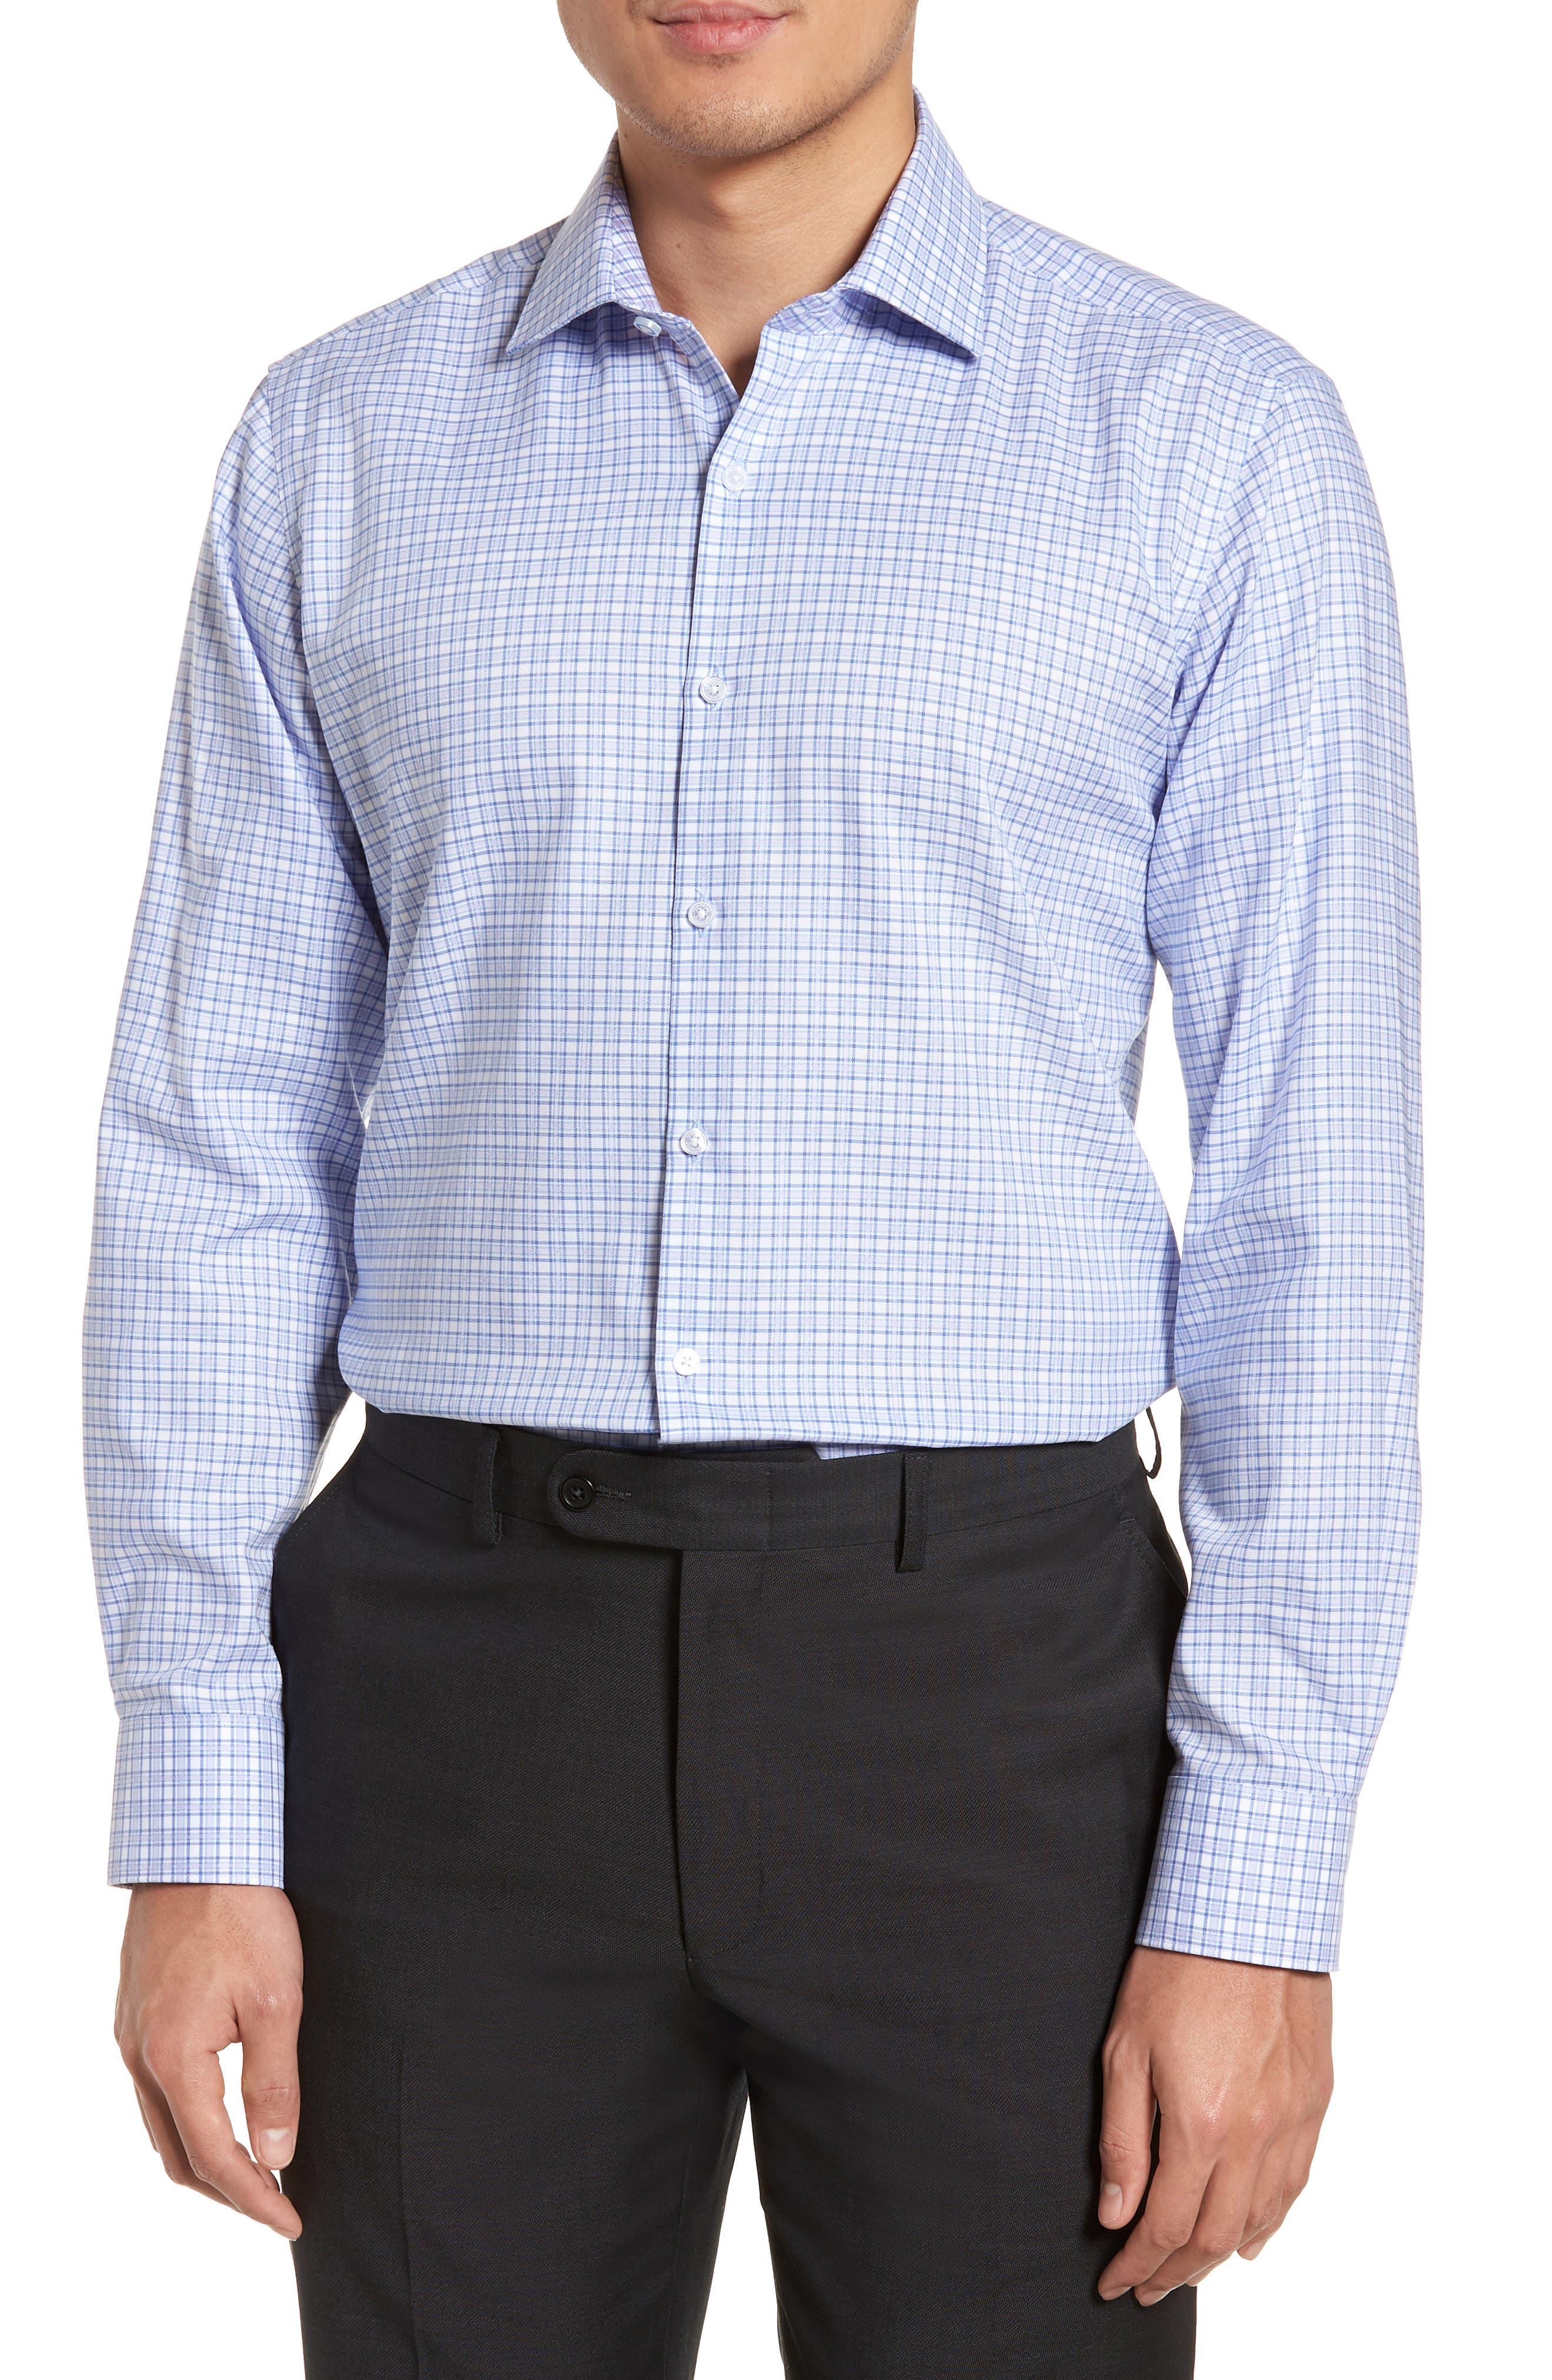 Nas Trim Fit Plaid Dress Shirt,                             Main thumbnail 1, color,                             Royal